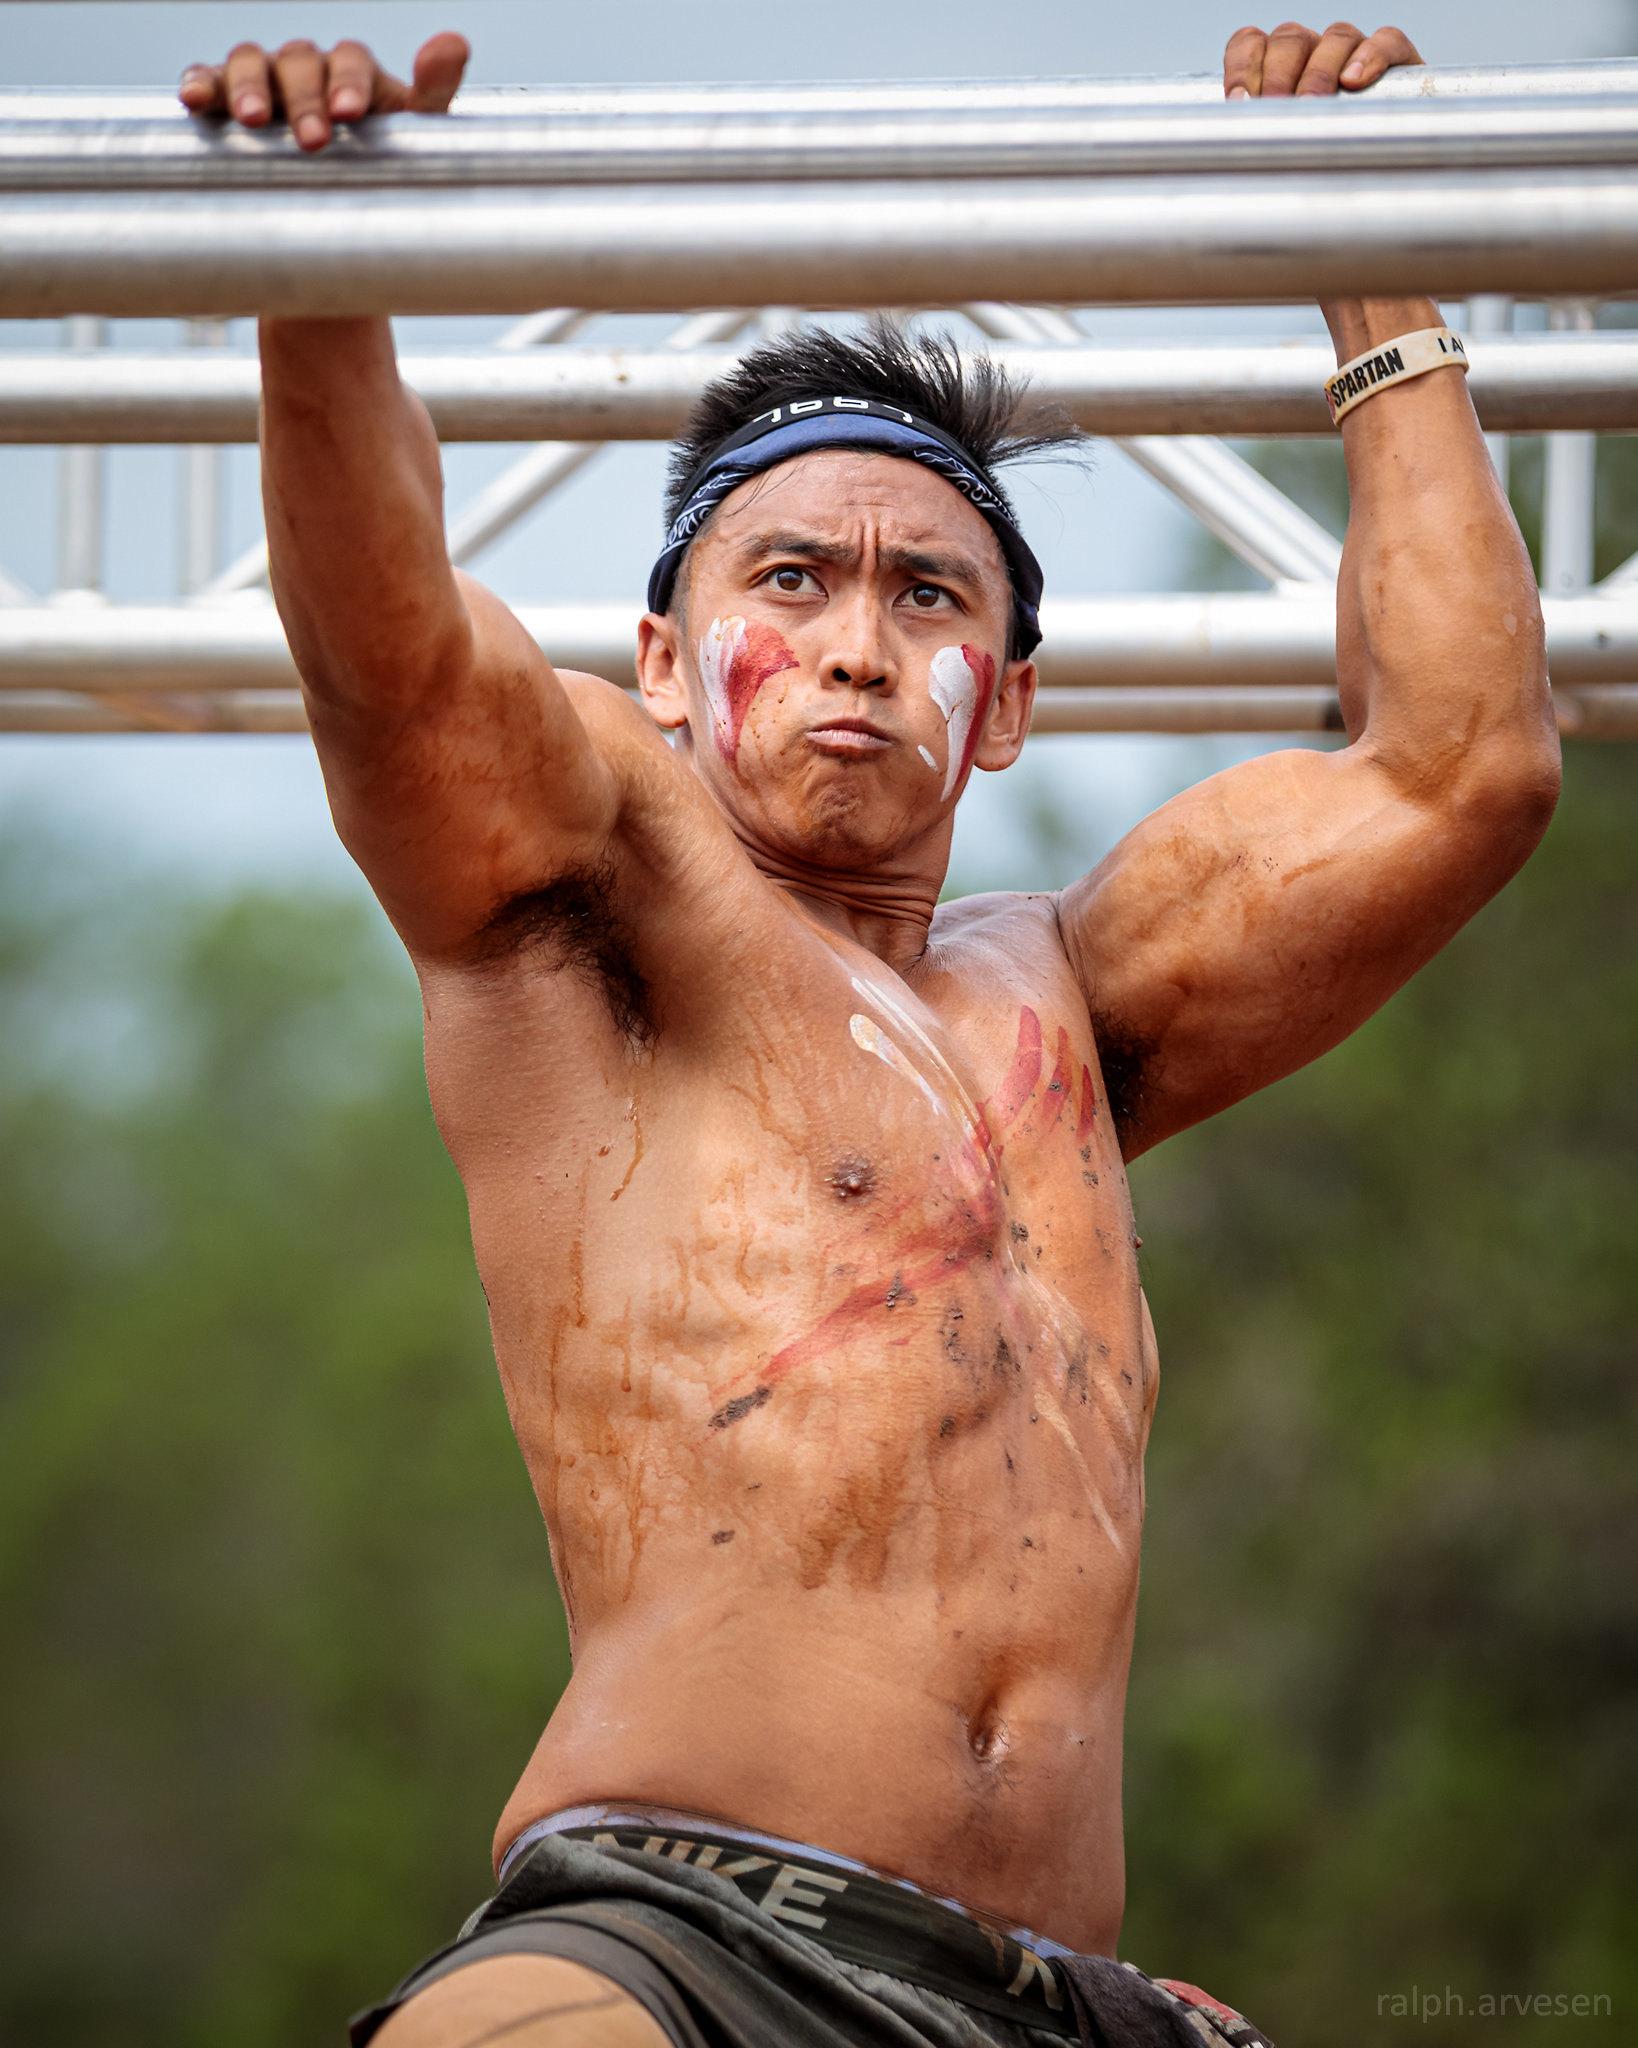 Spartan Super | Texas Review | Ralph Arvesen